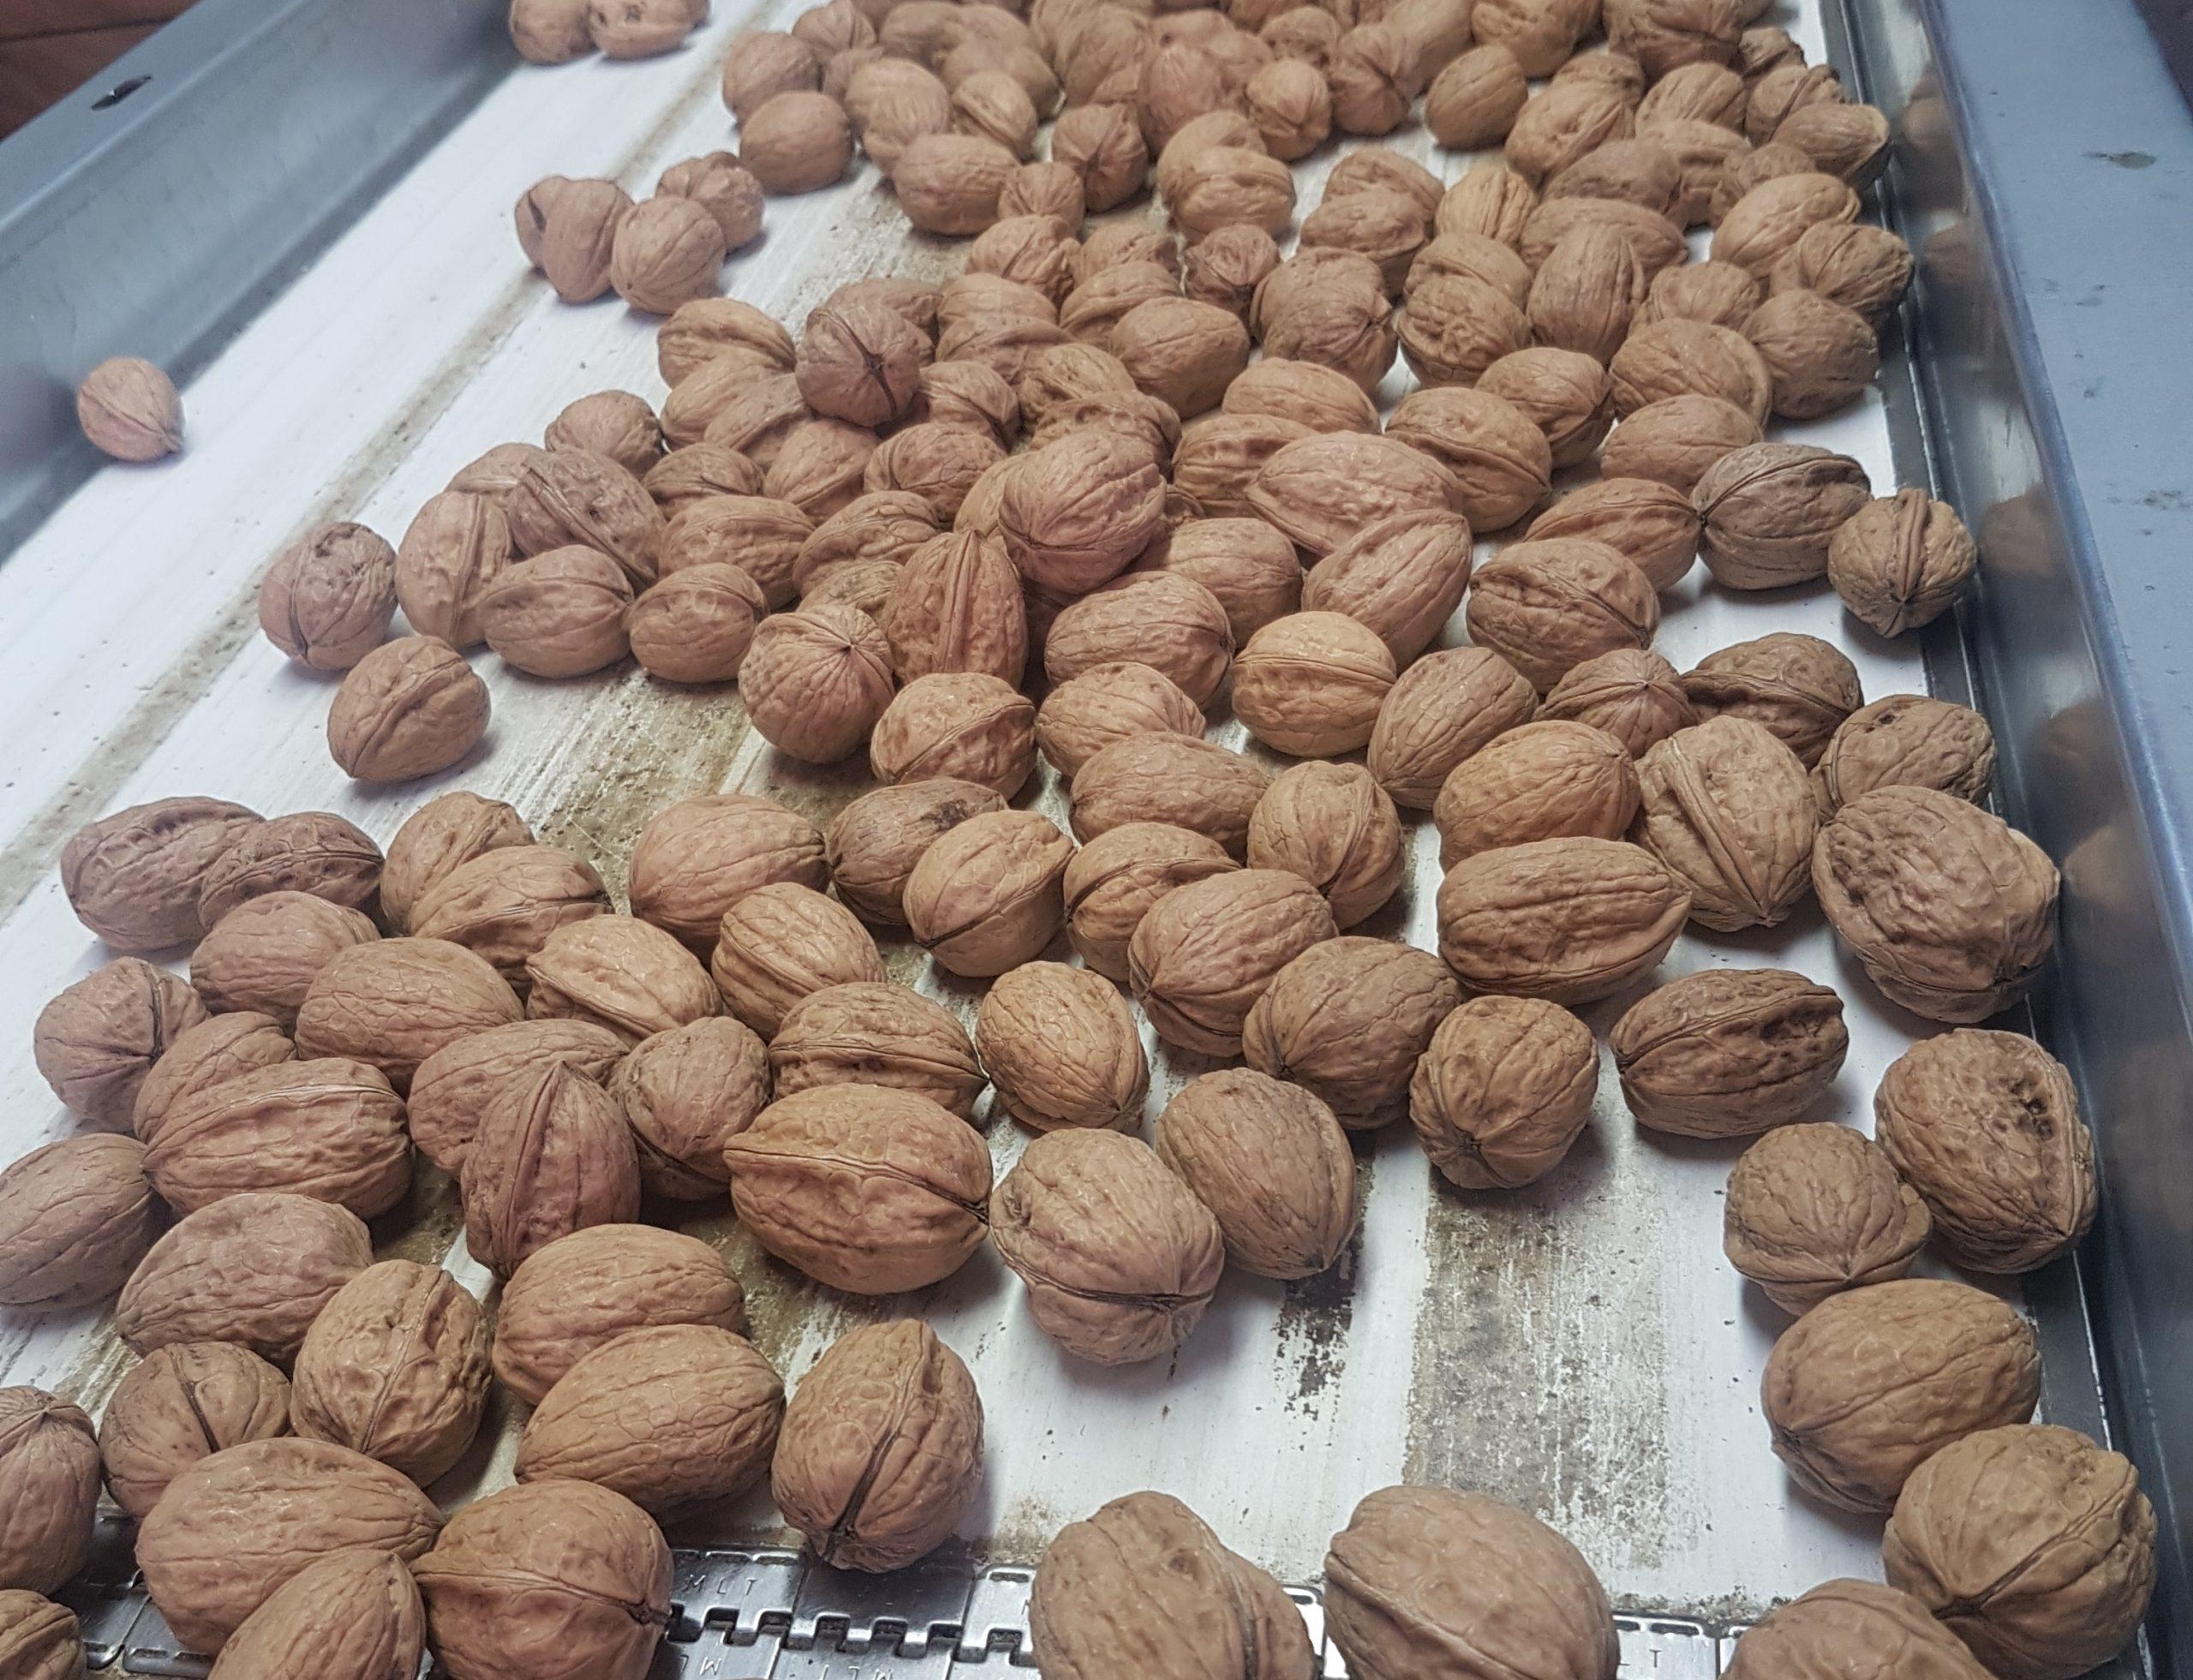 Walnuts on a conveyor belt